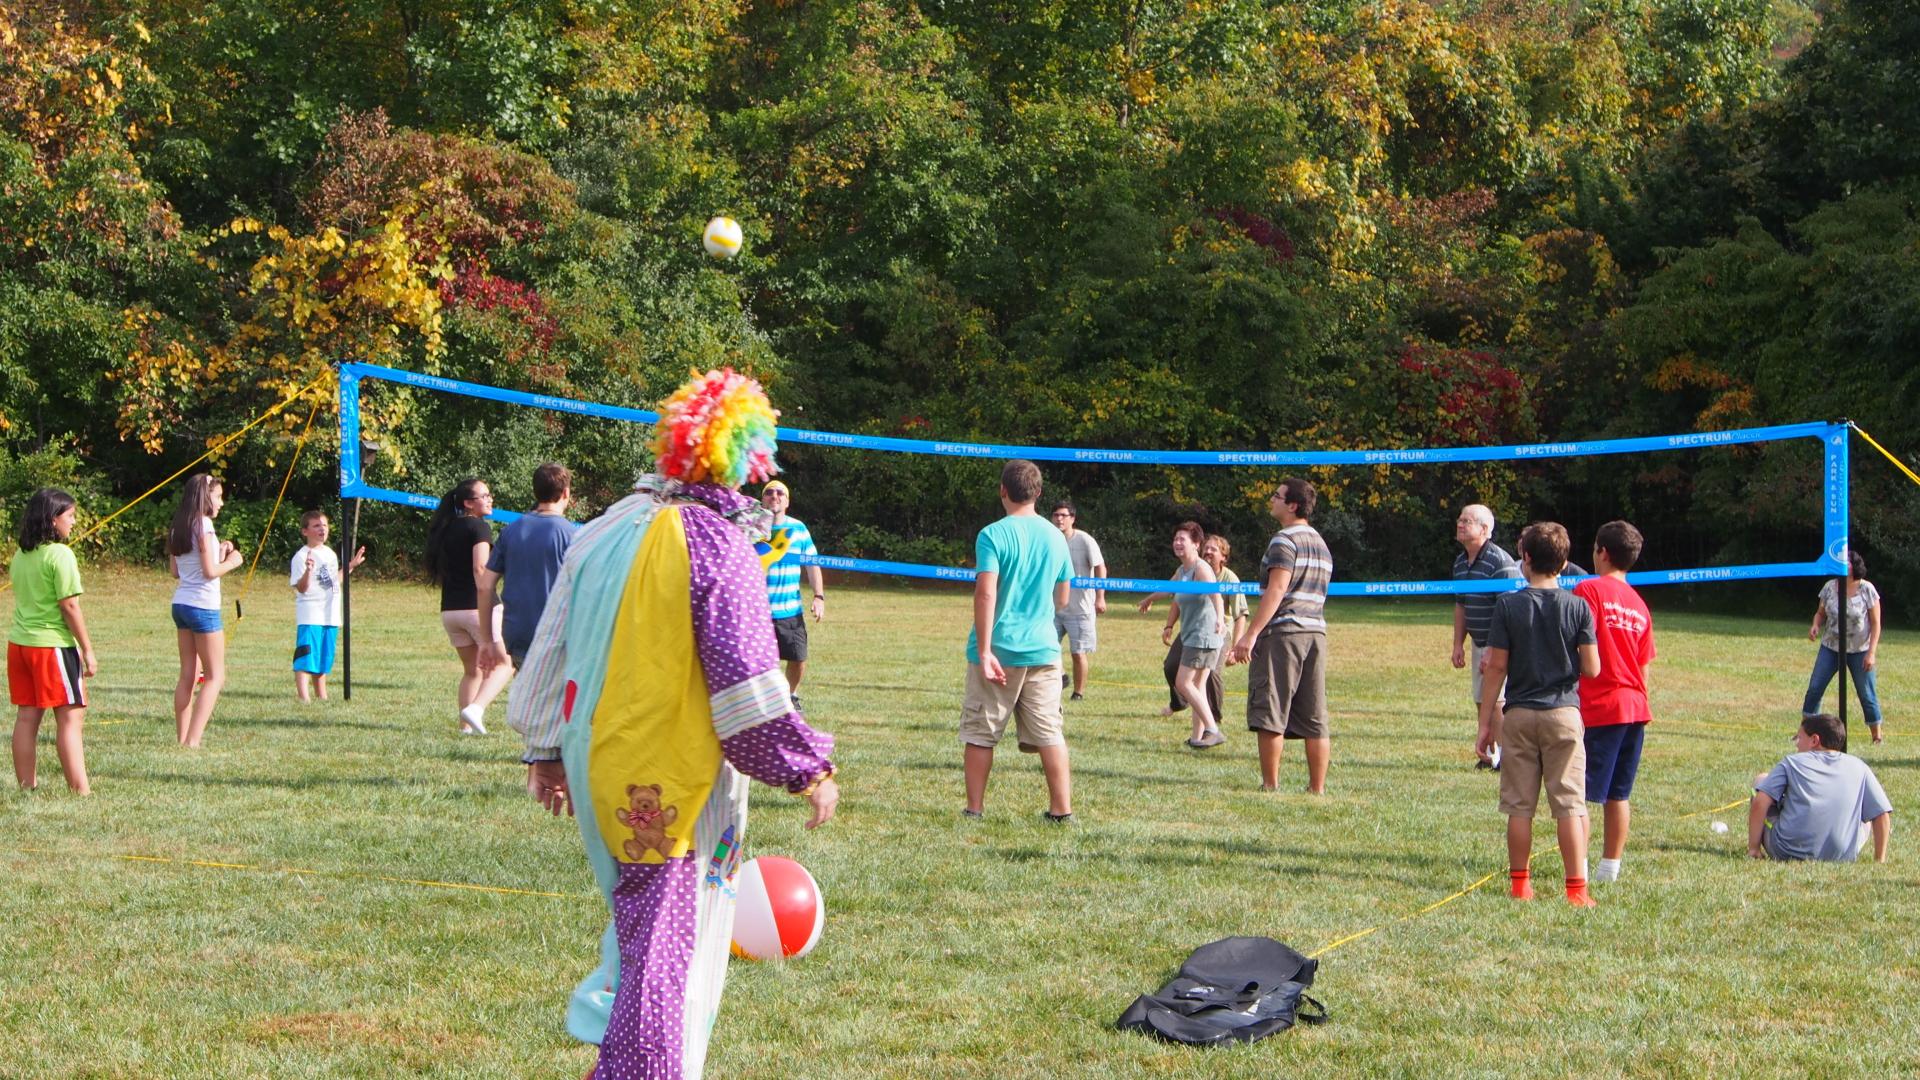 sjn picnic 2014 the clown